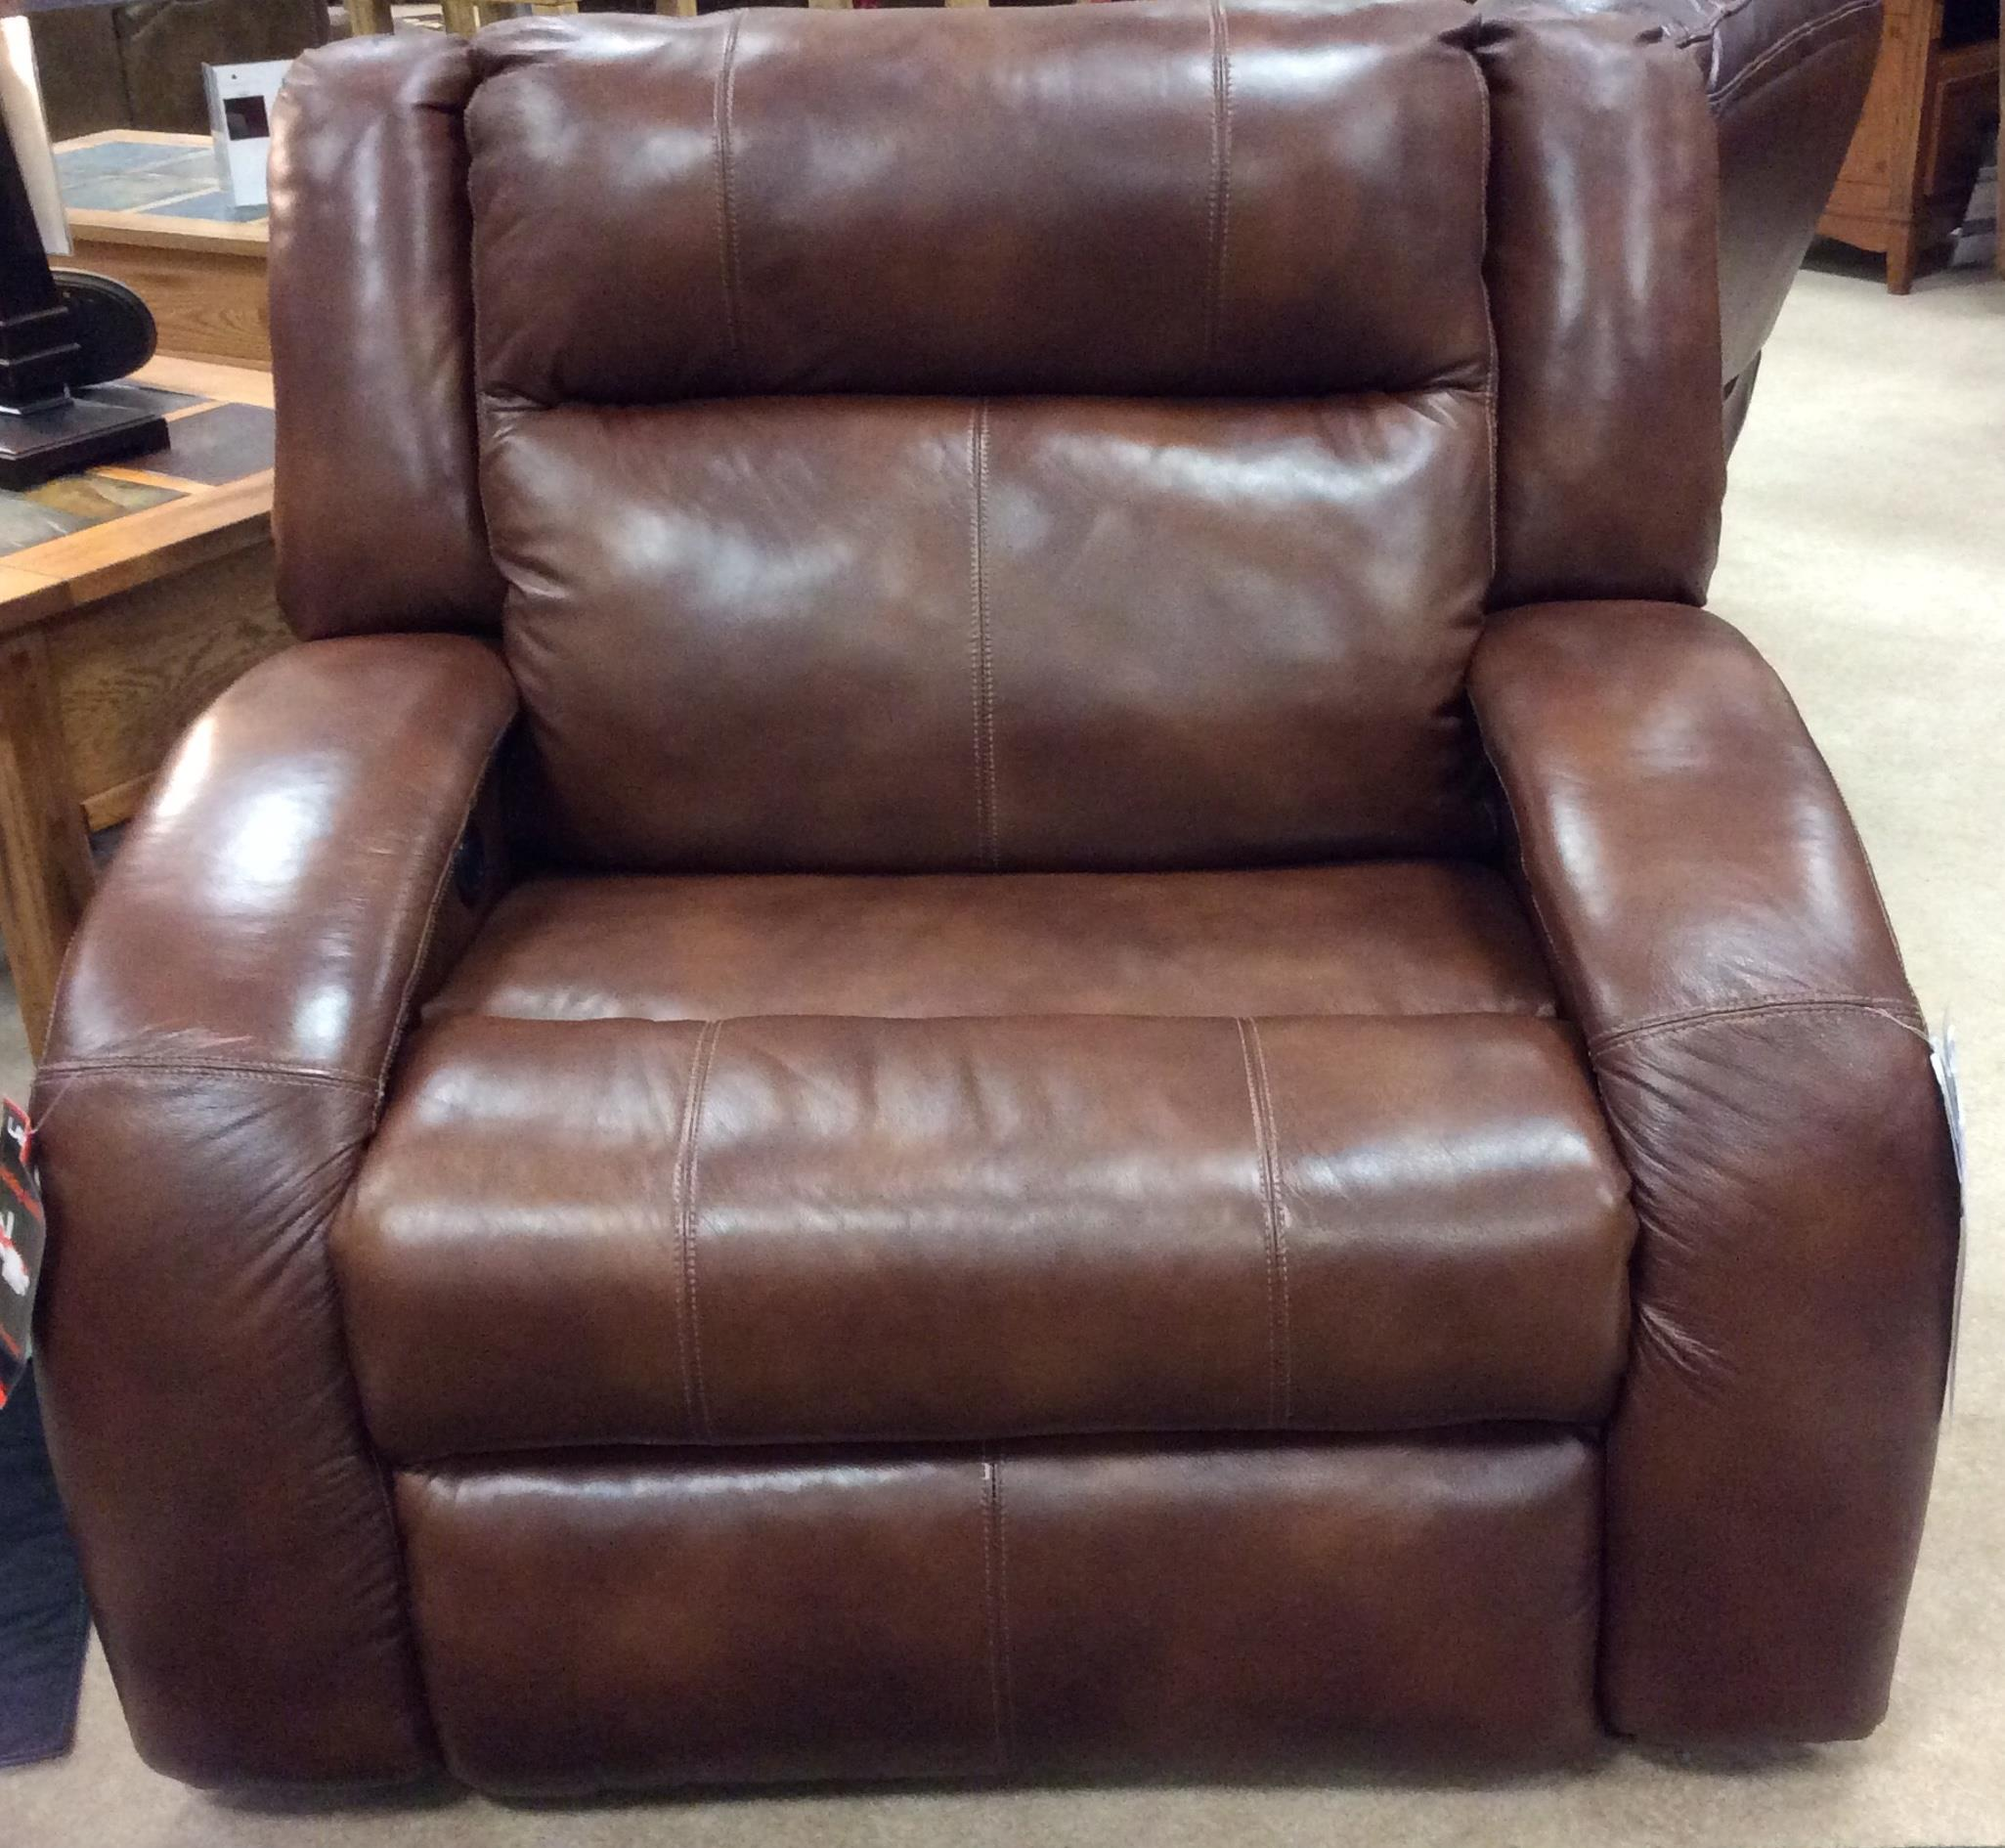 Astonishing Southern Motion Maverick Reclining Power Chair And 1 2 Inzonedesignstudio Interior Chair Design Inzonedesignstudiocom